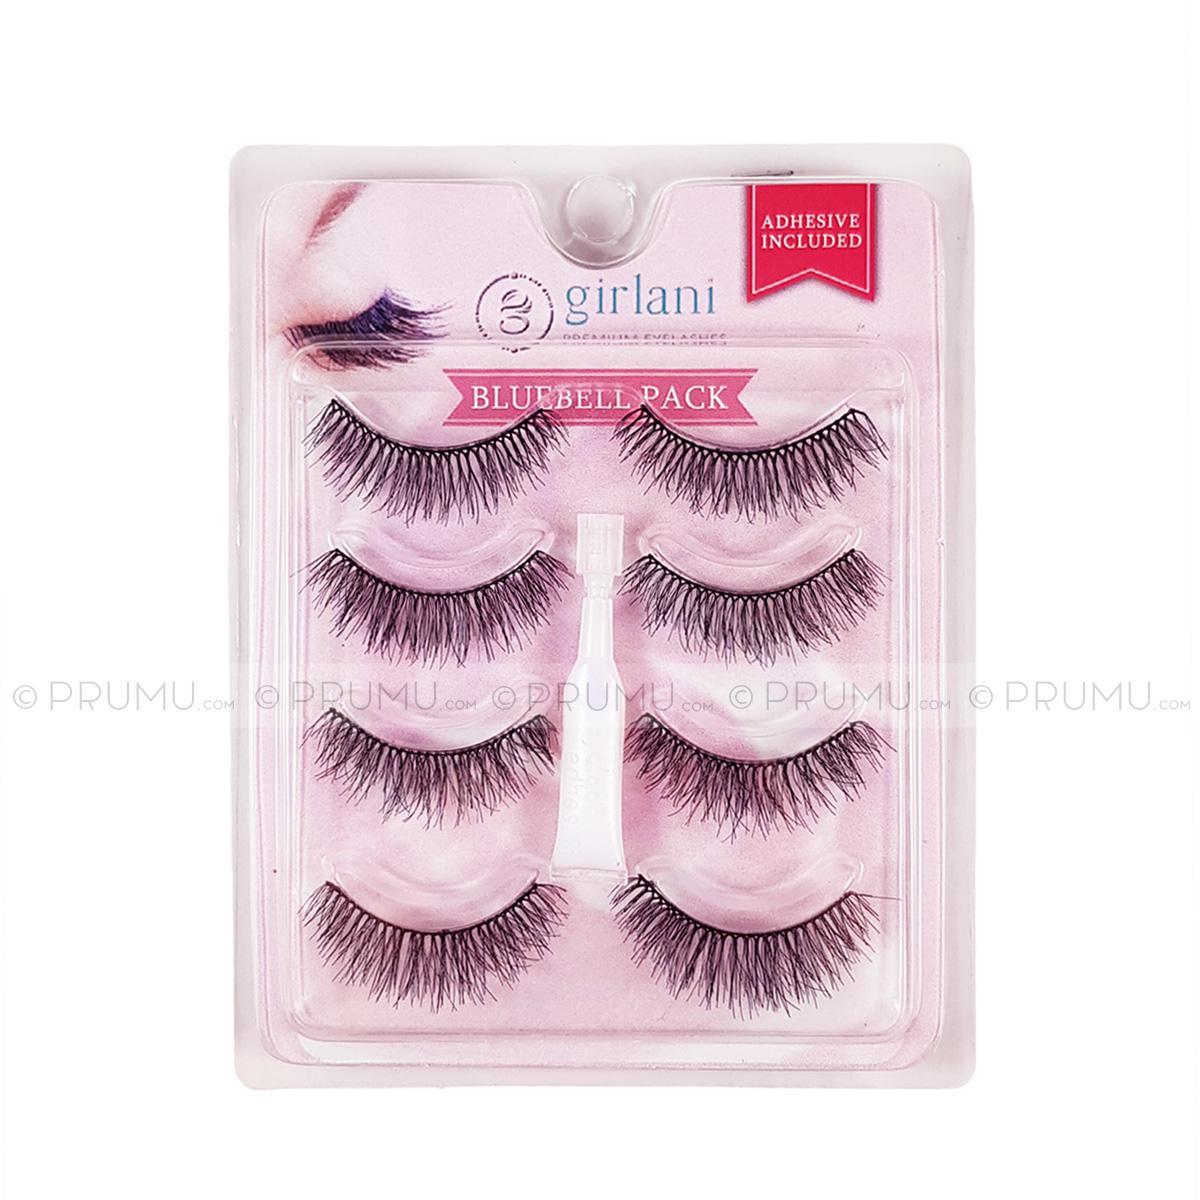 Bulu Mata Palsu - Girlani Bluebell Pack - Premium False Eyelashes